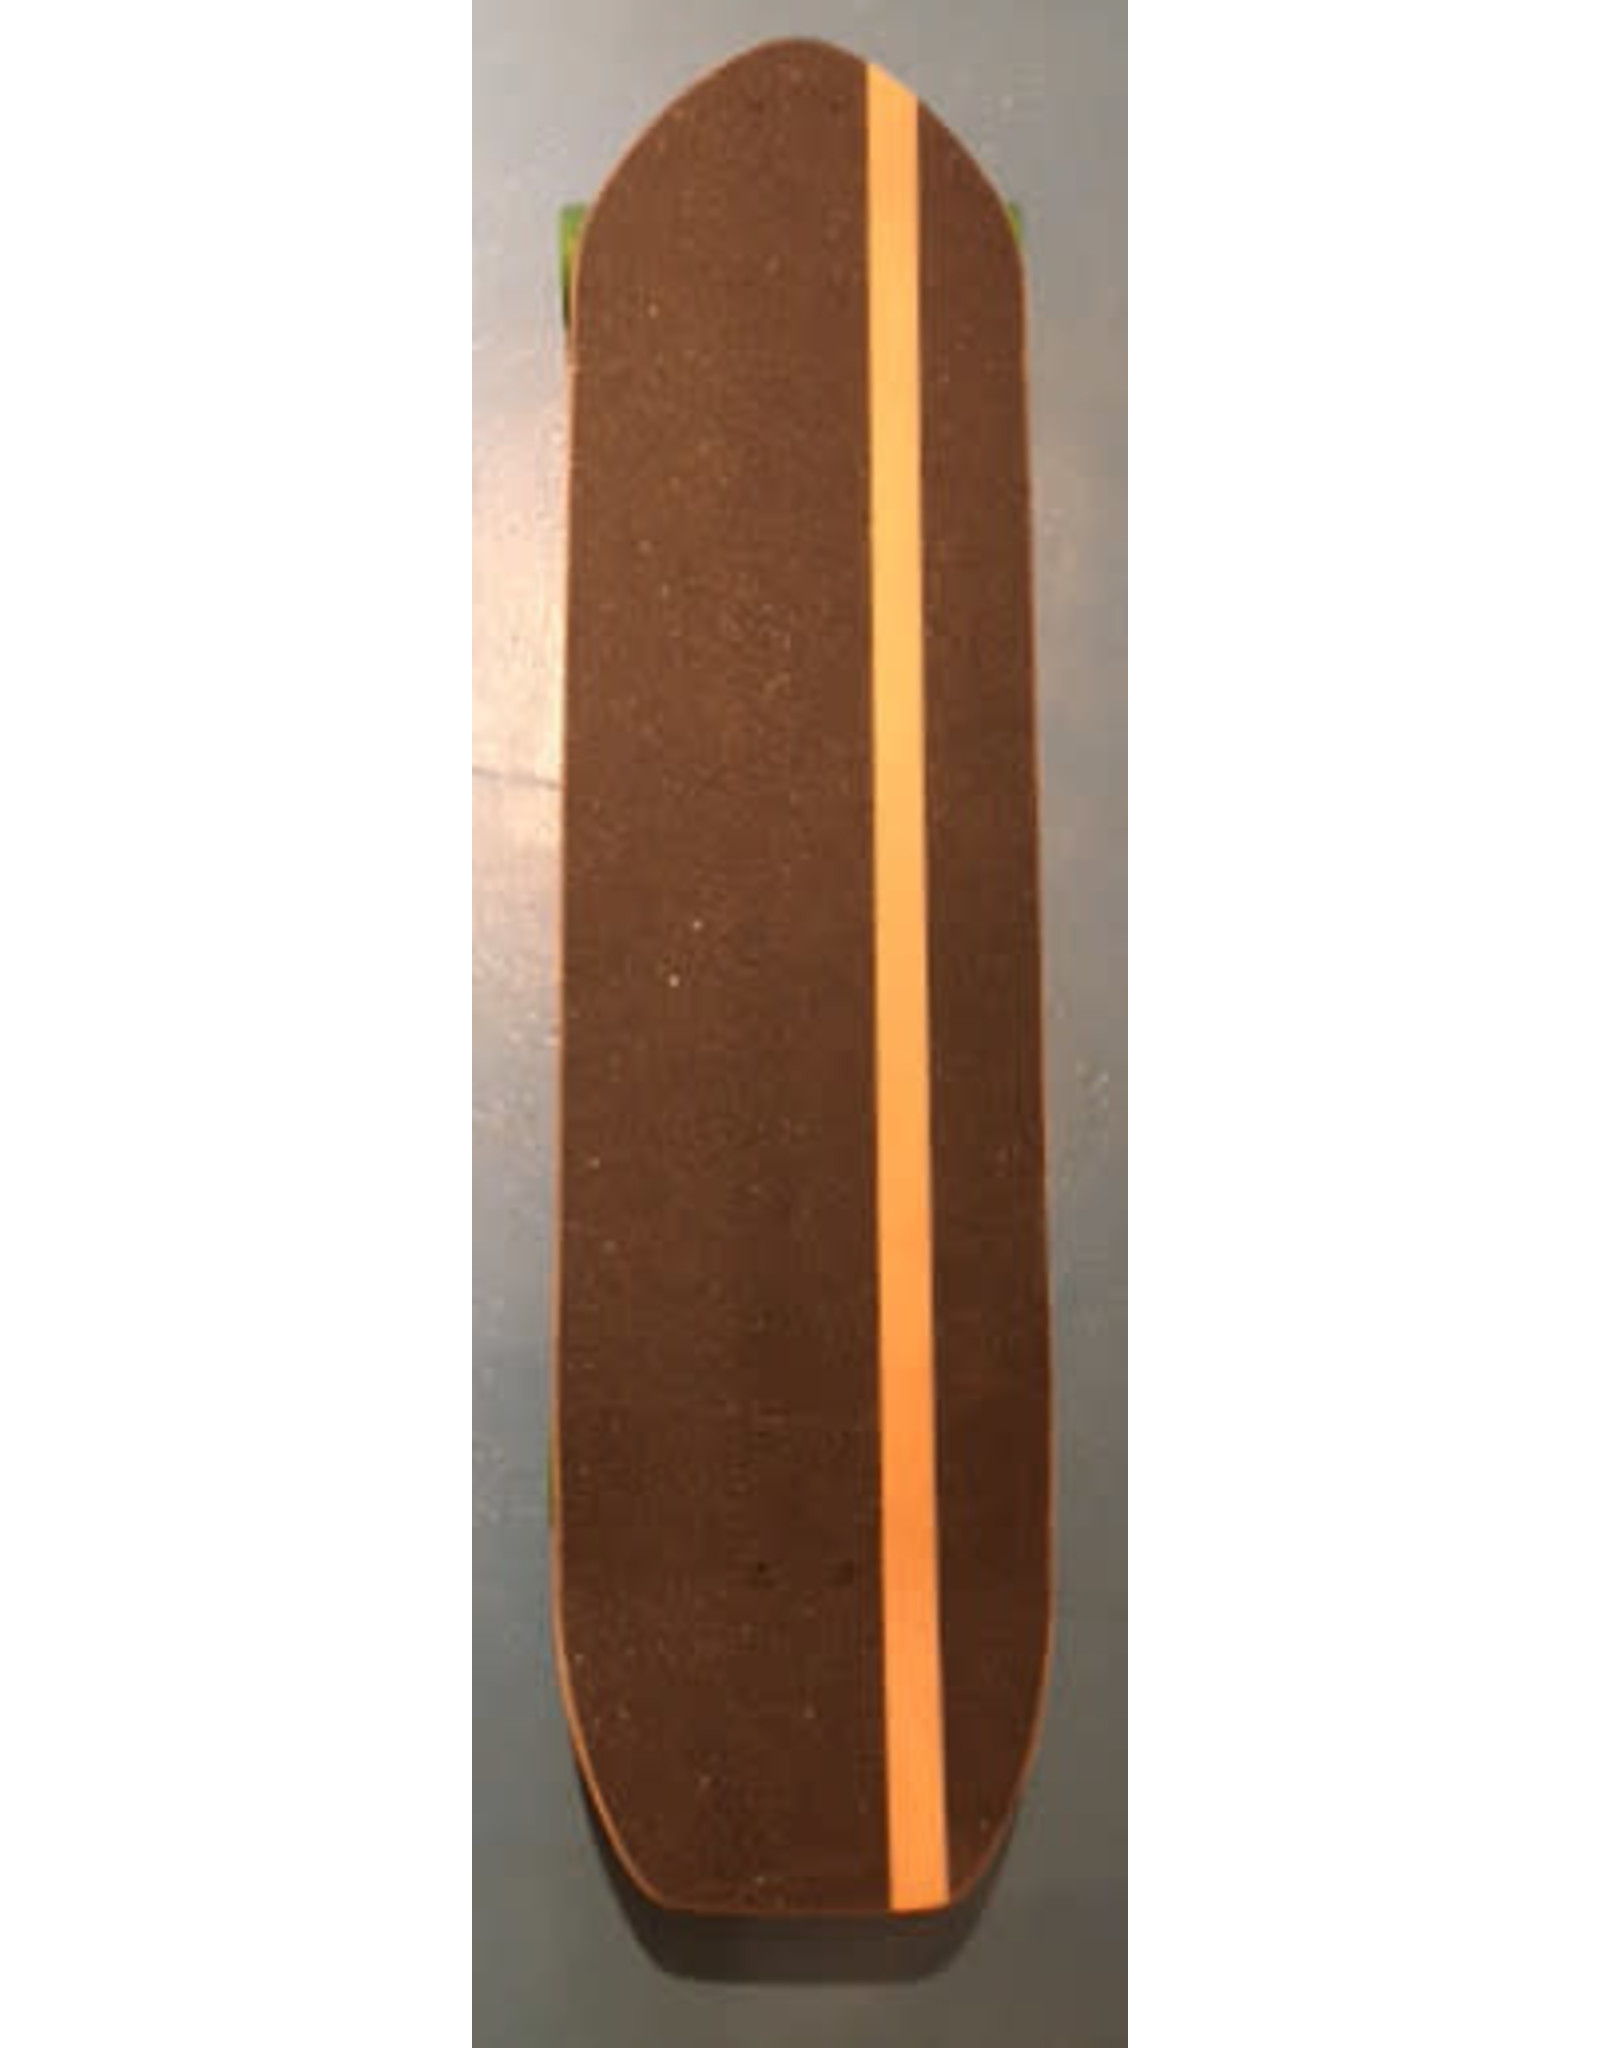 "Jucker Hawaii Jucker Hawaii 37"" Longboard  Freeride PRO Compleet"